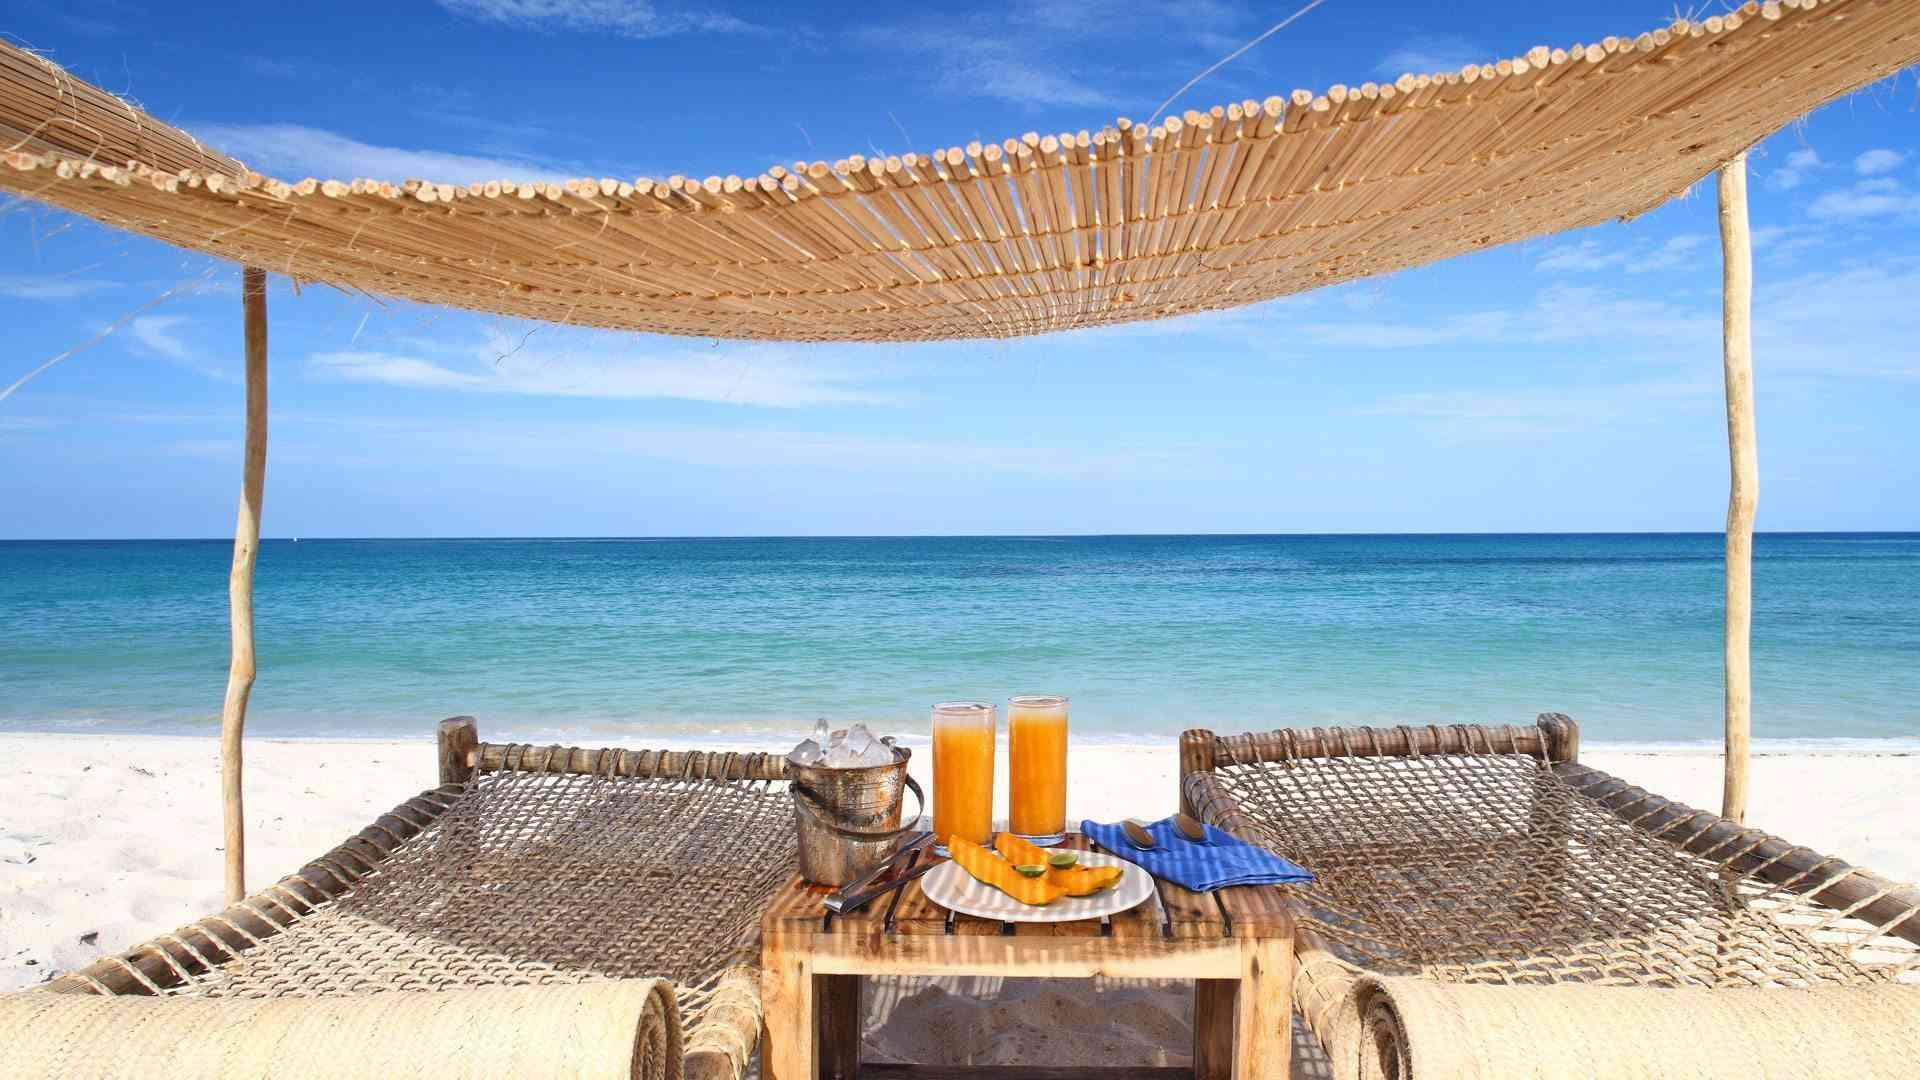 The Top 10 Beach Destinations In Tanzania